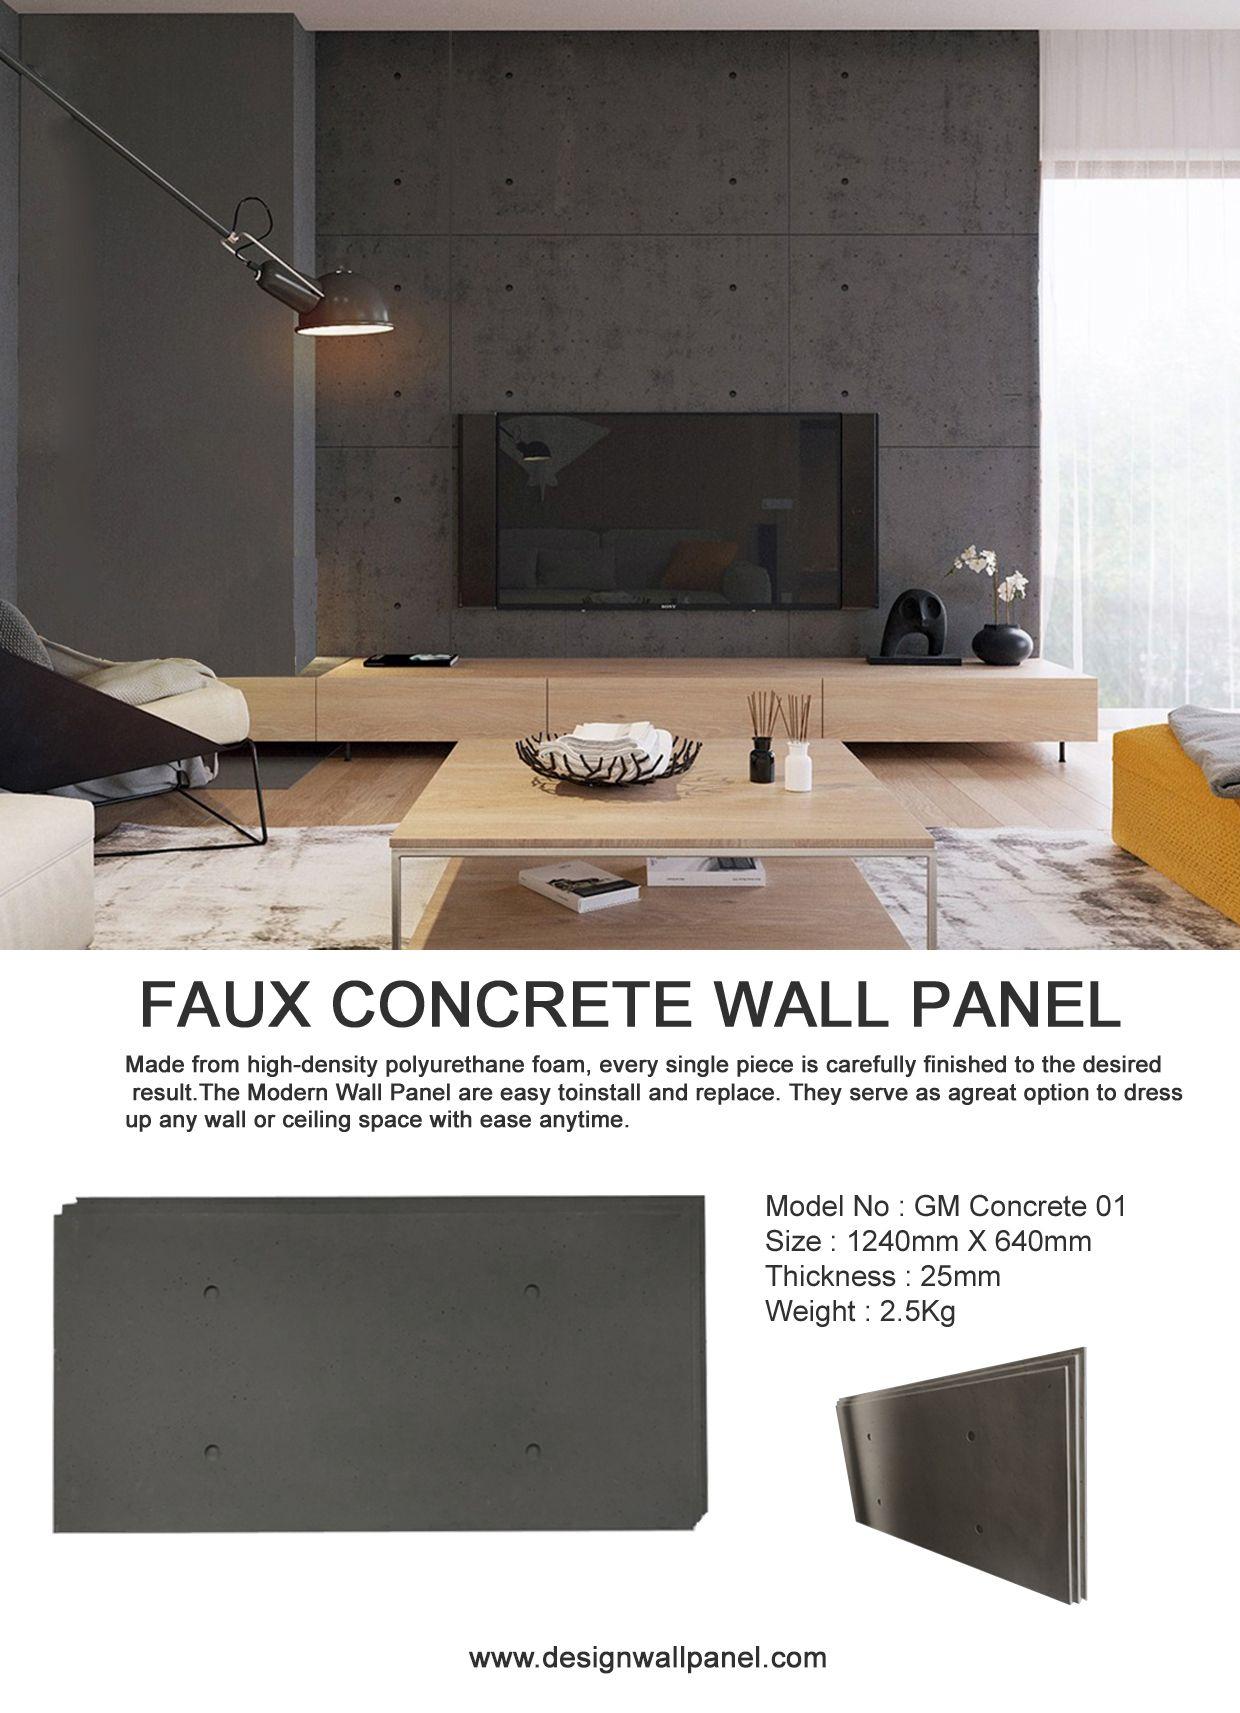 Faux Concrete Wall Panel In 2020 Faux Brick Walls Interior Wall Design Faux Concrete Wall